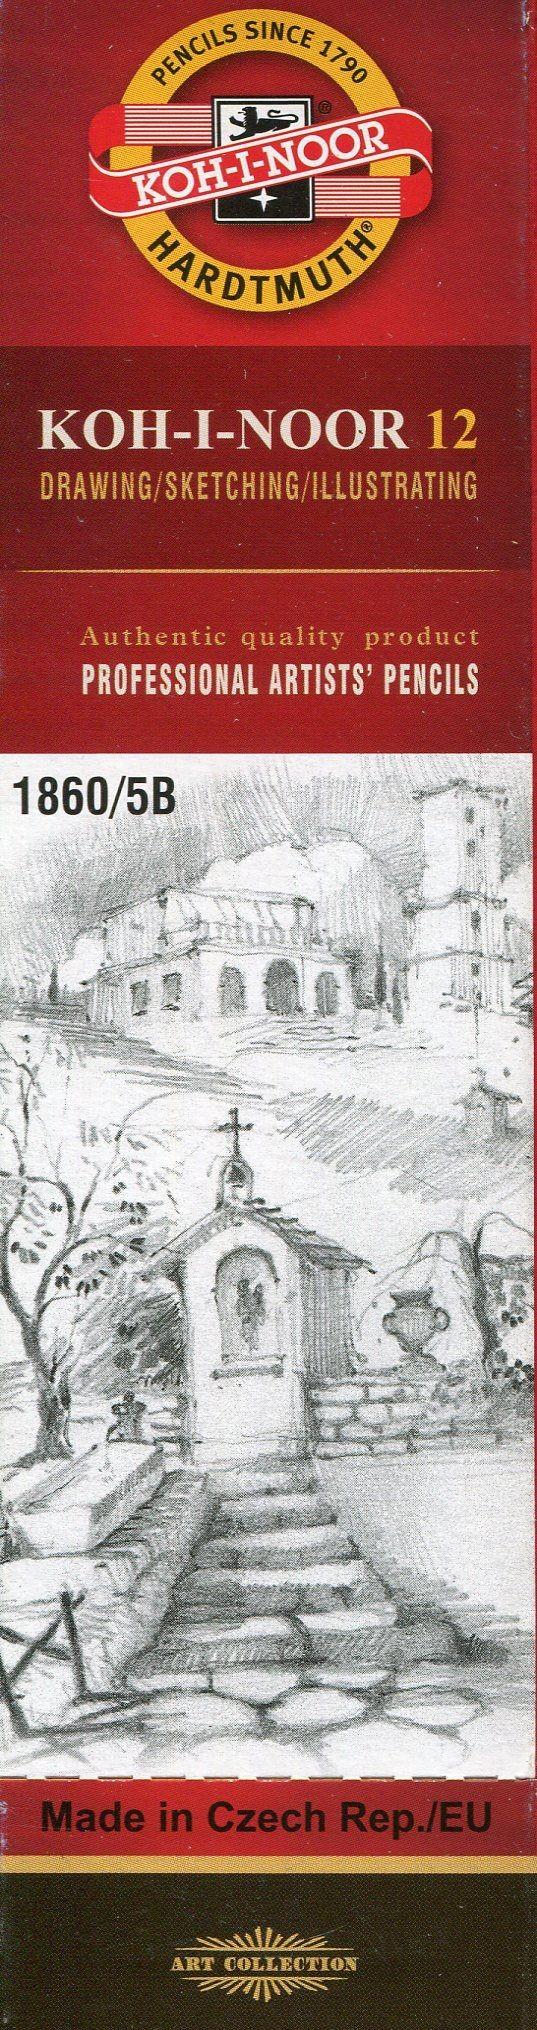 Koh-I-Noor Koh-I-Noor Ołówek grafitowy 1860/5B 12 szt